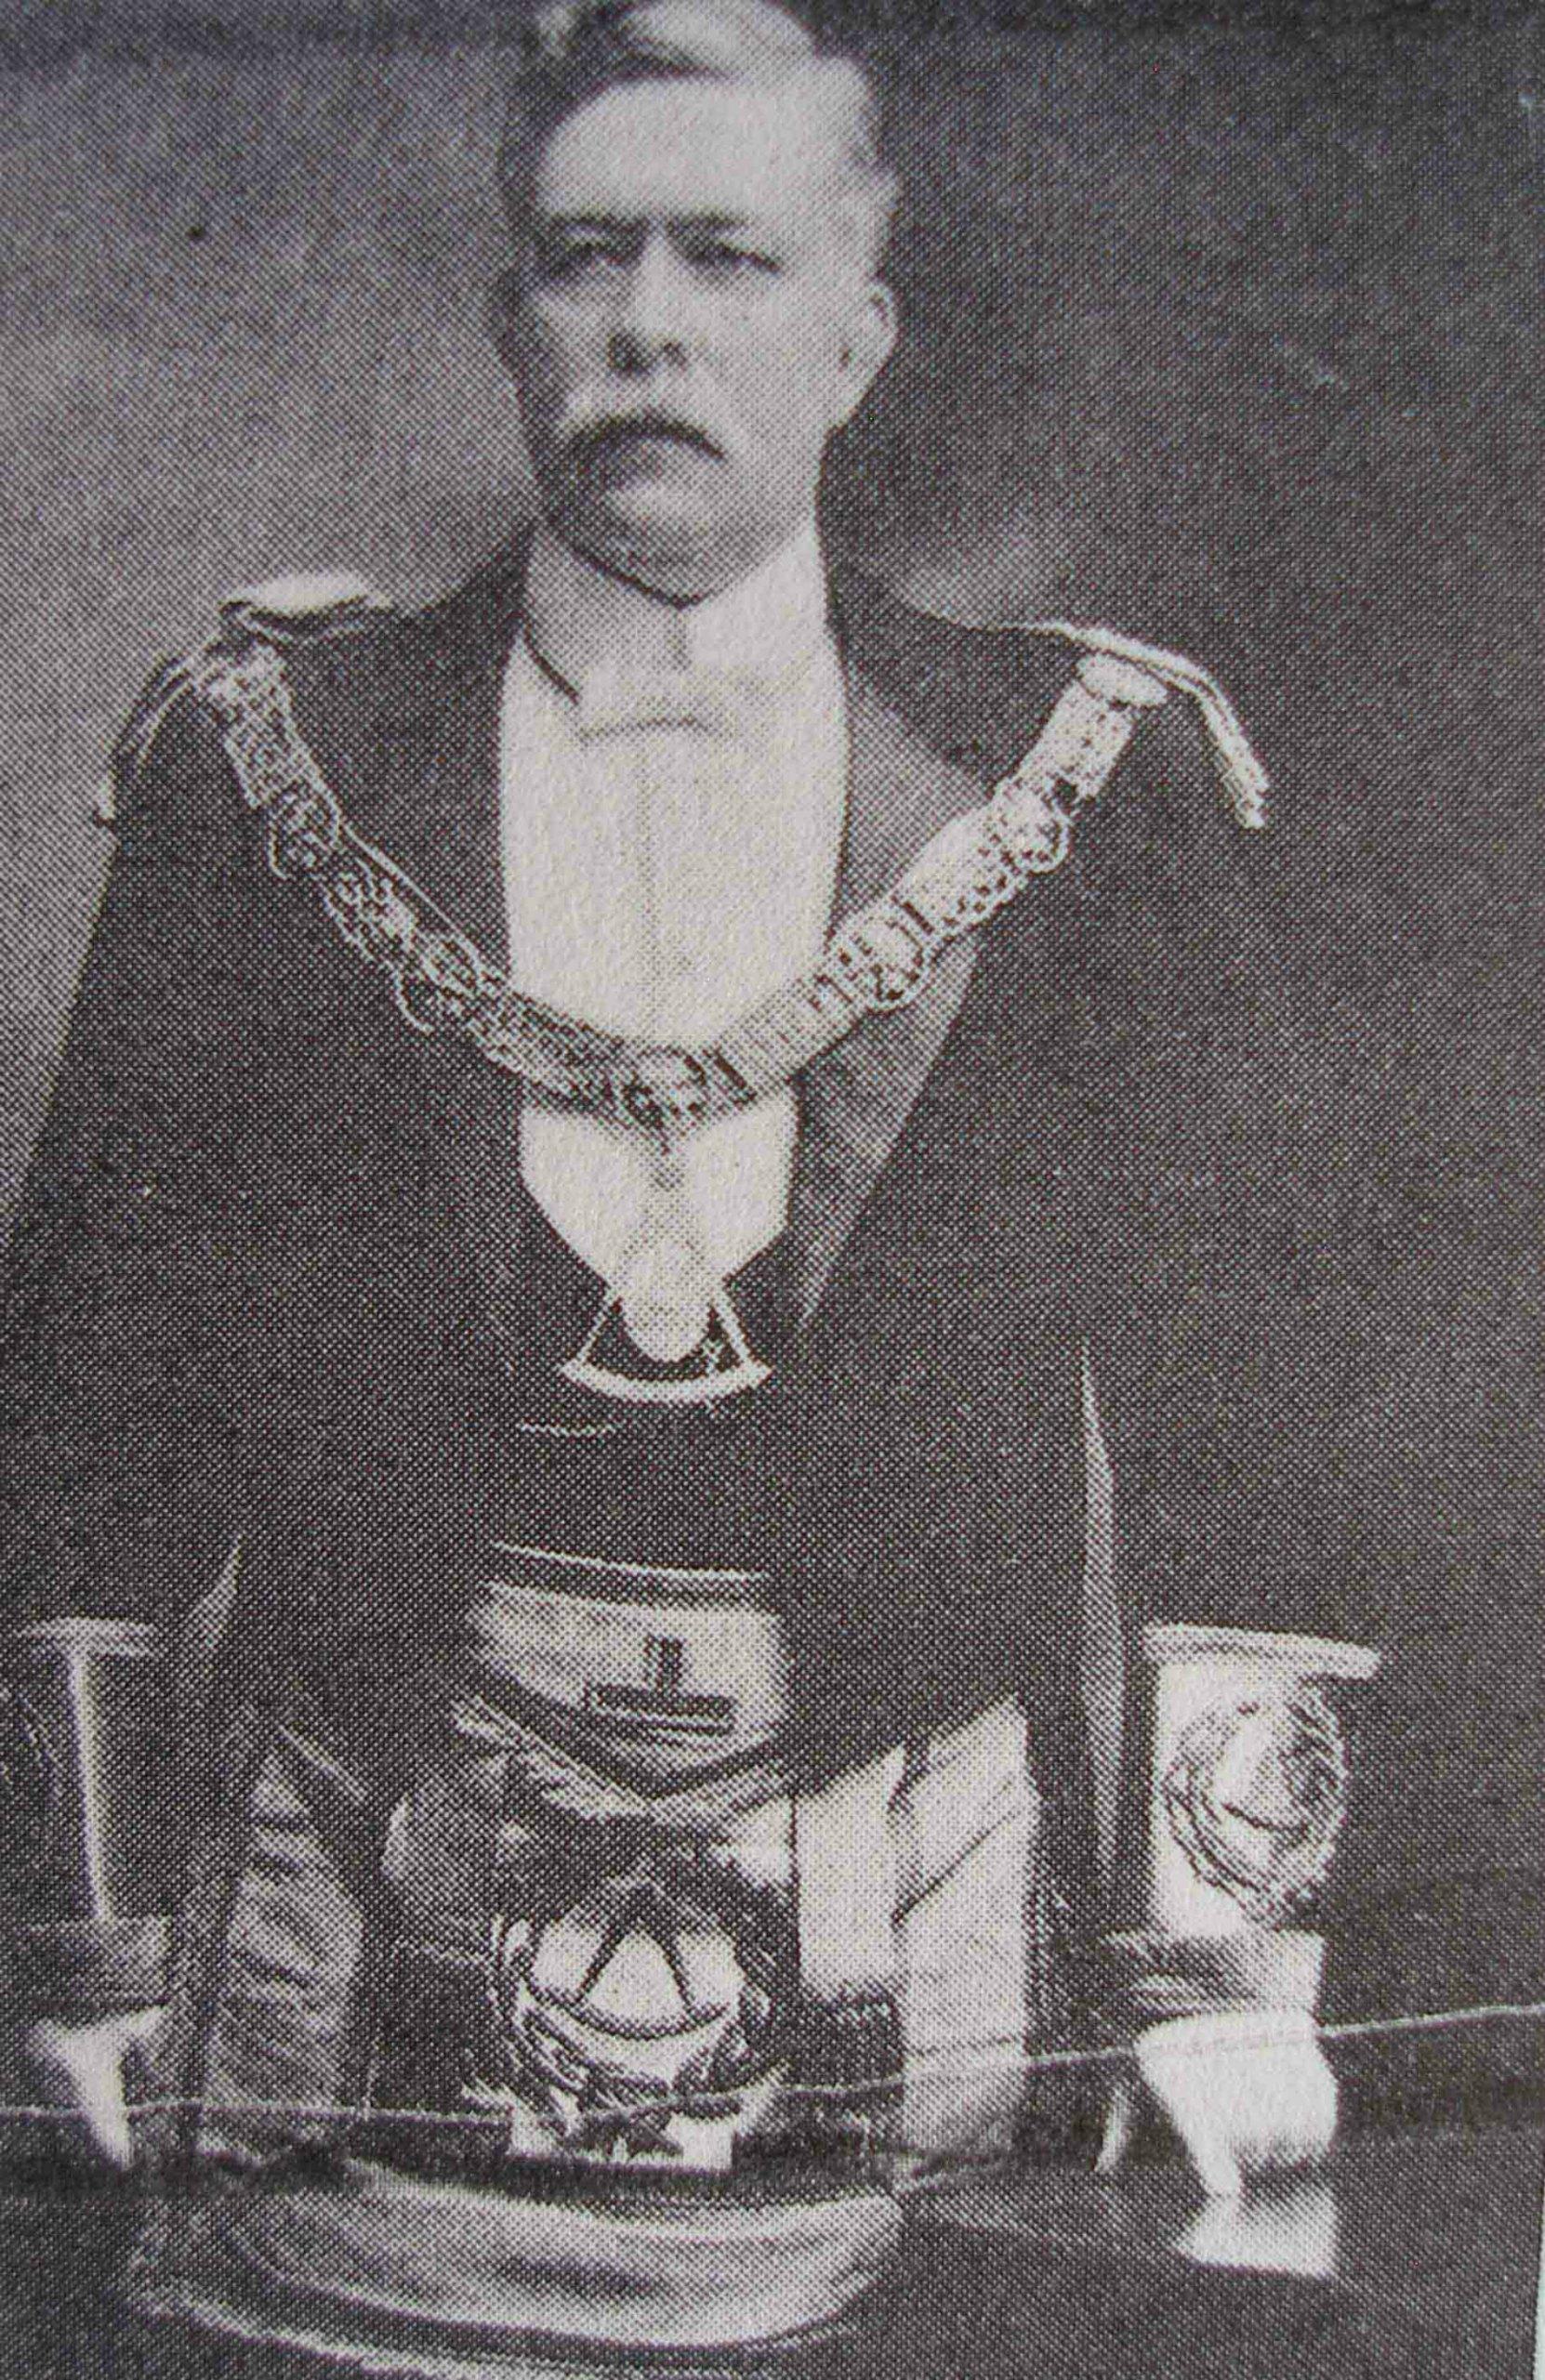 William Kyle Houston as Grand Master of B.C., circa 1908